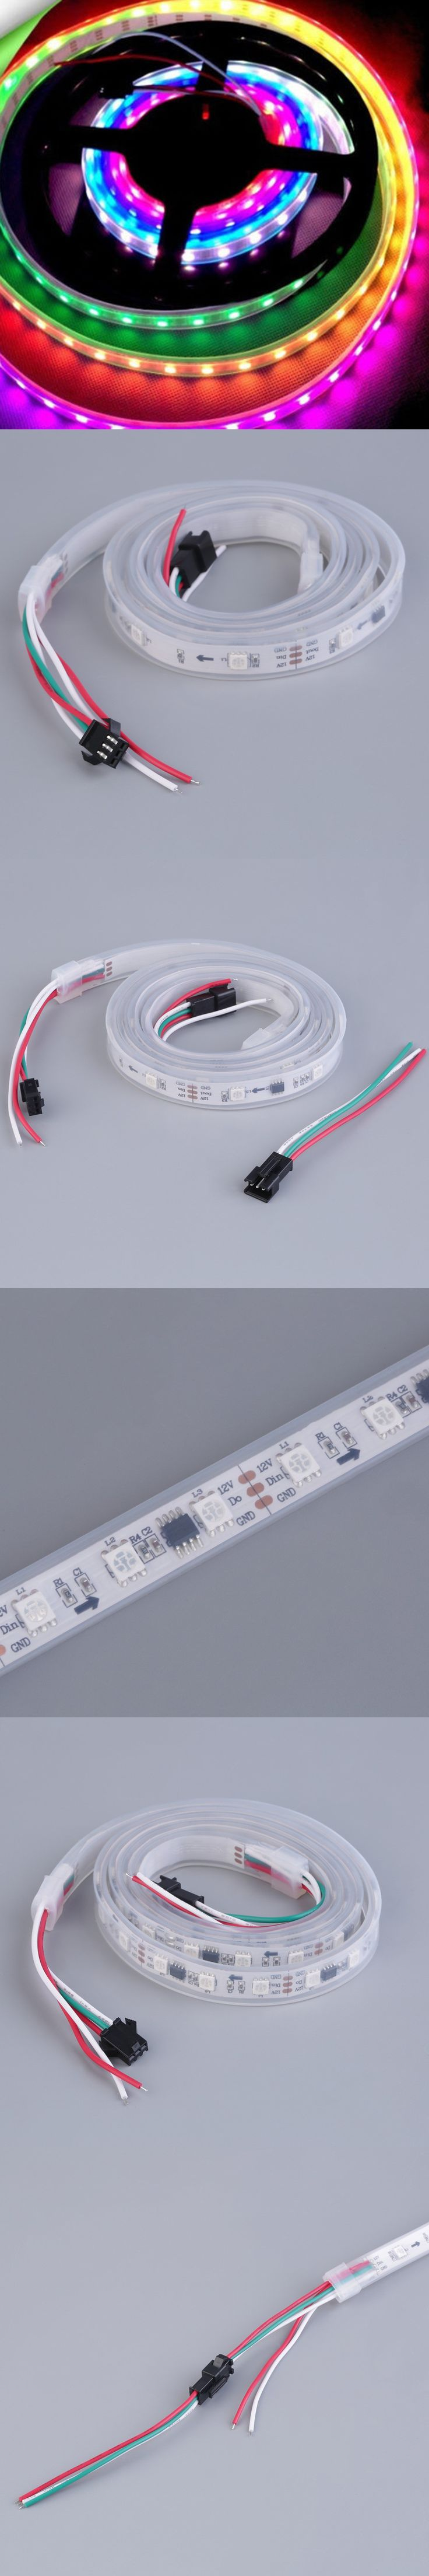 5m rgb cool warm white led strip ribbon tape light smd 5050 waterproof flexible ws2811 tiras